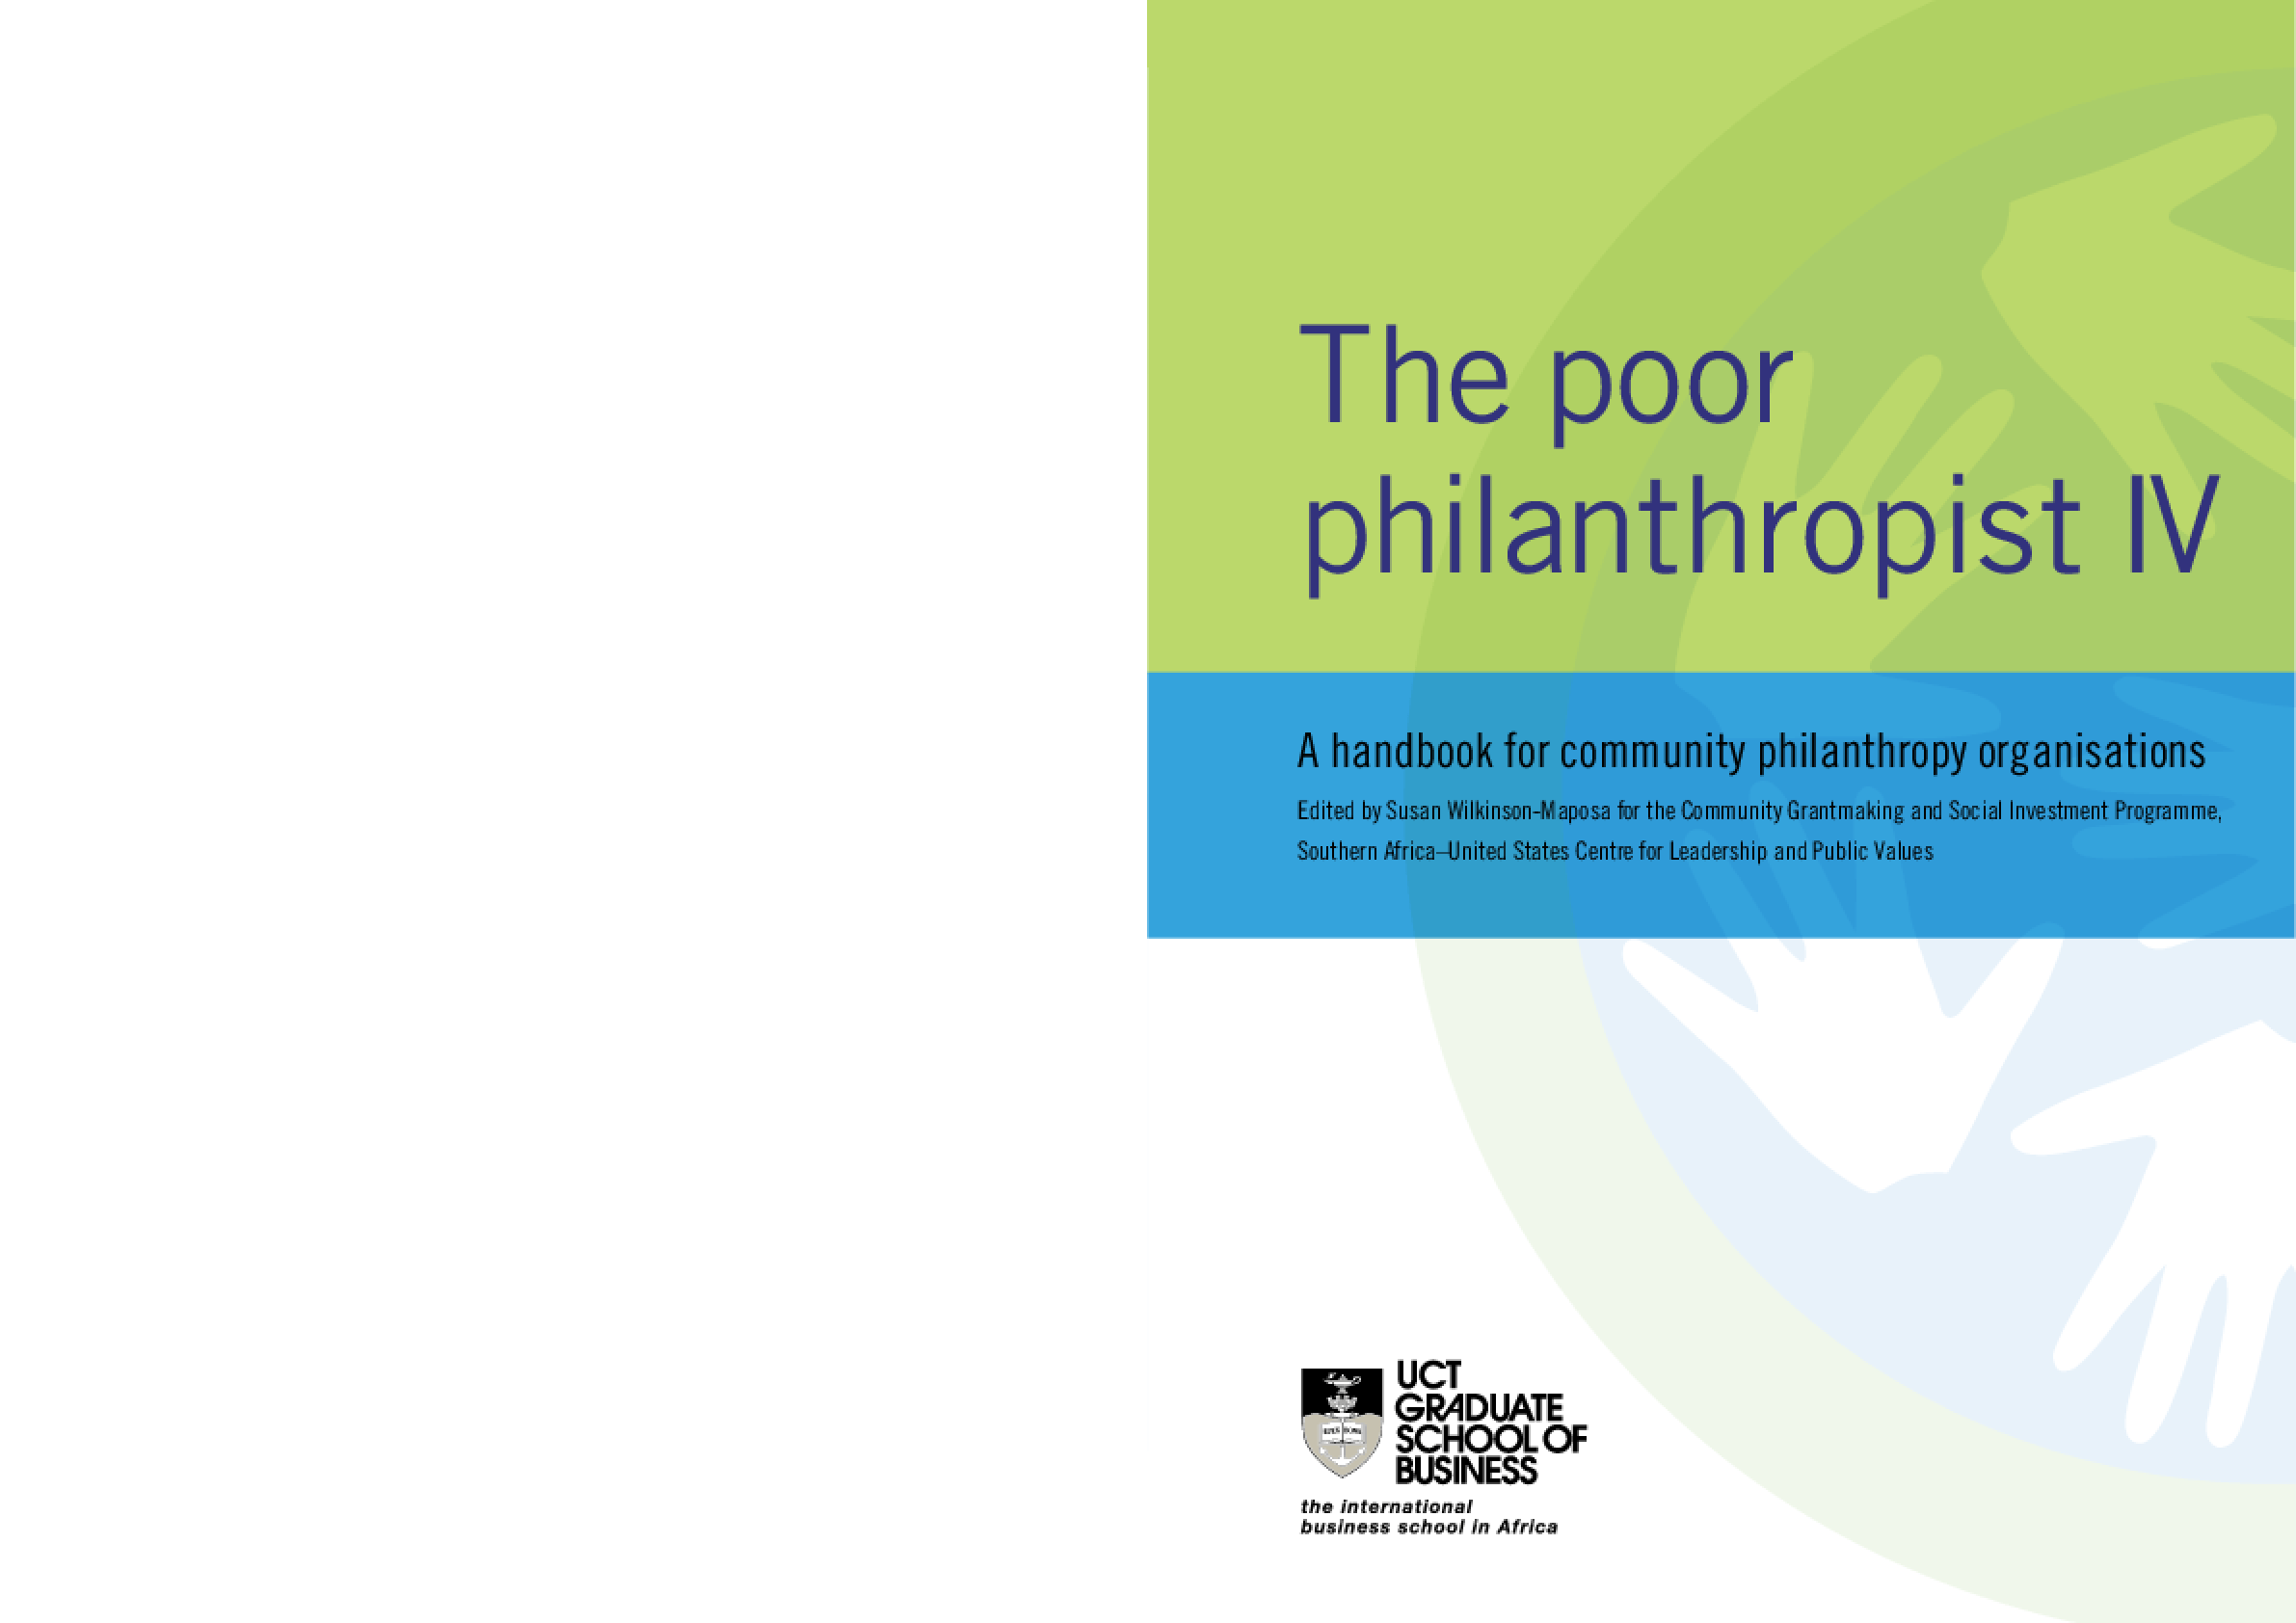 Poor Philanthropist IV: A Handbook for Community Philanthropy Organisations